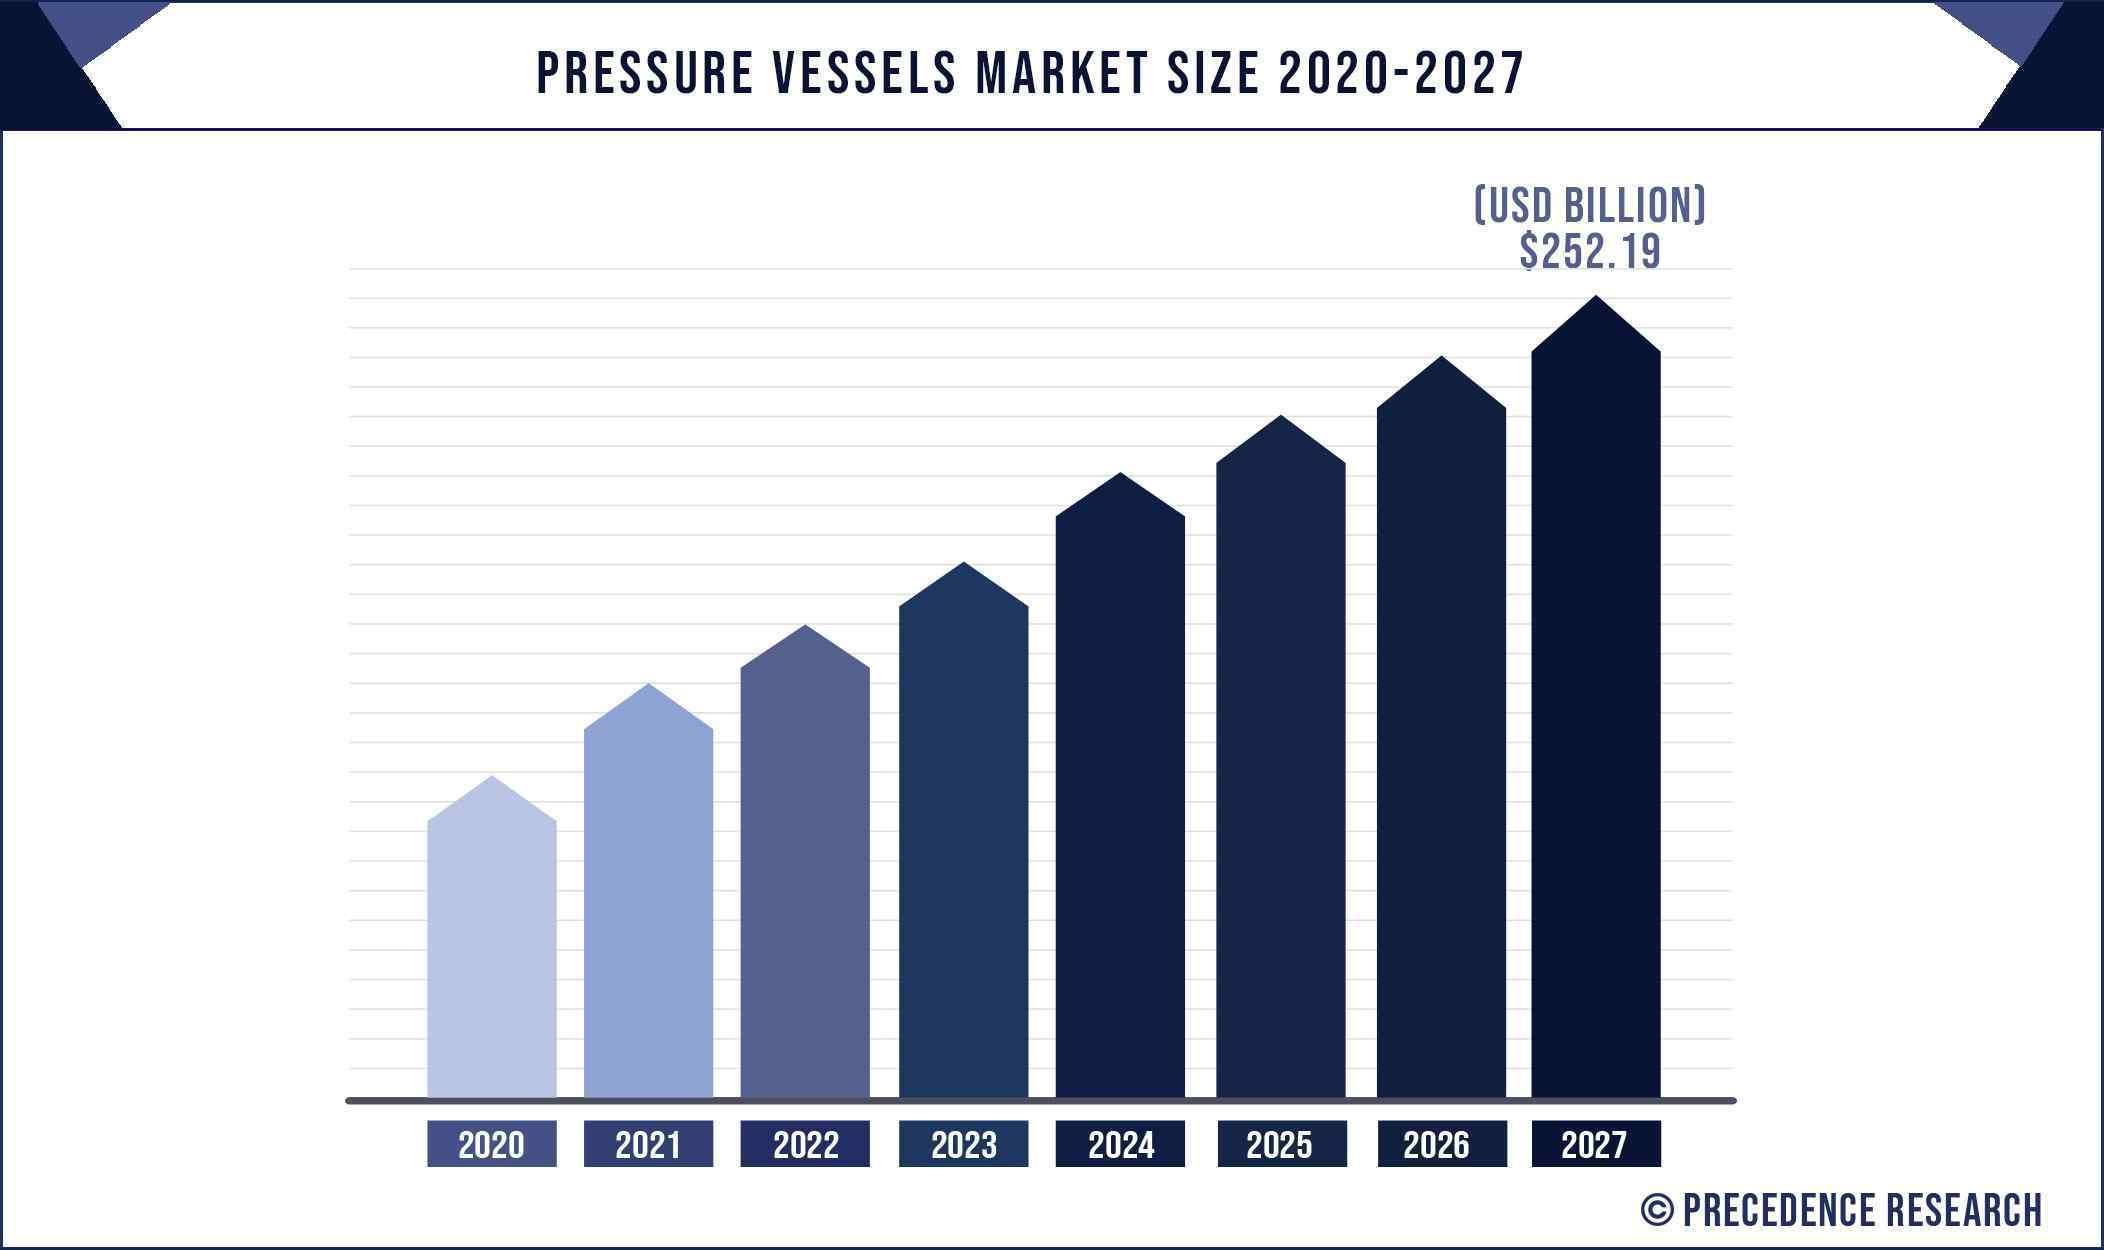 Pressure Vessels Market Size 2020 to 2027